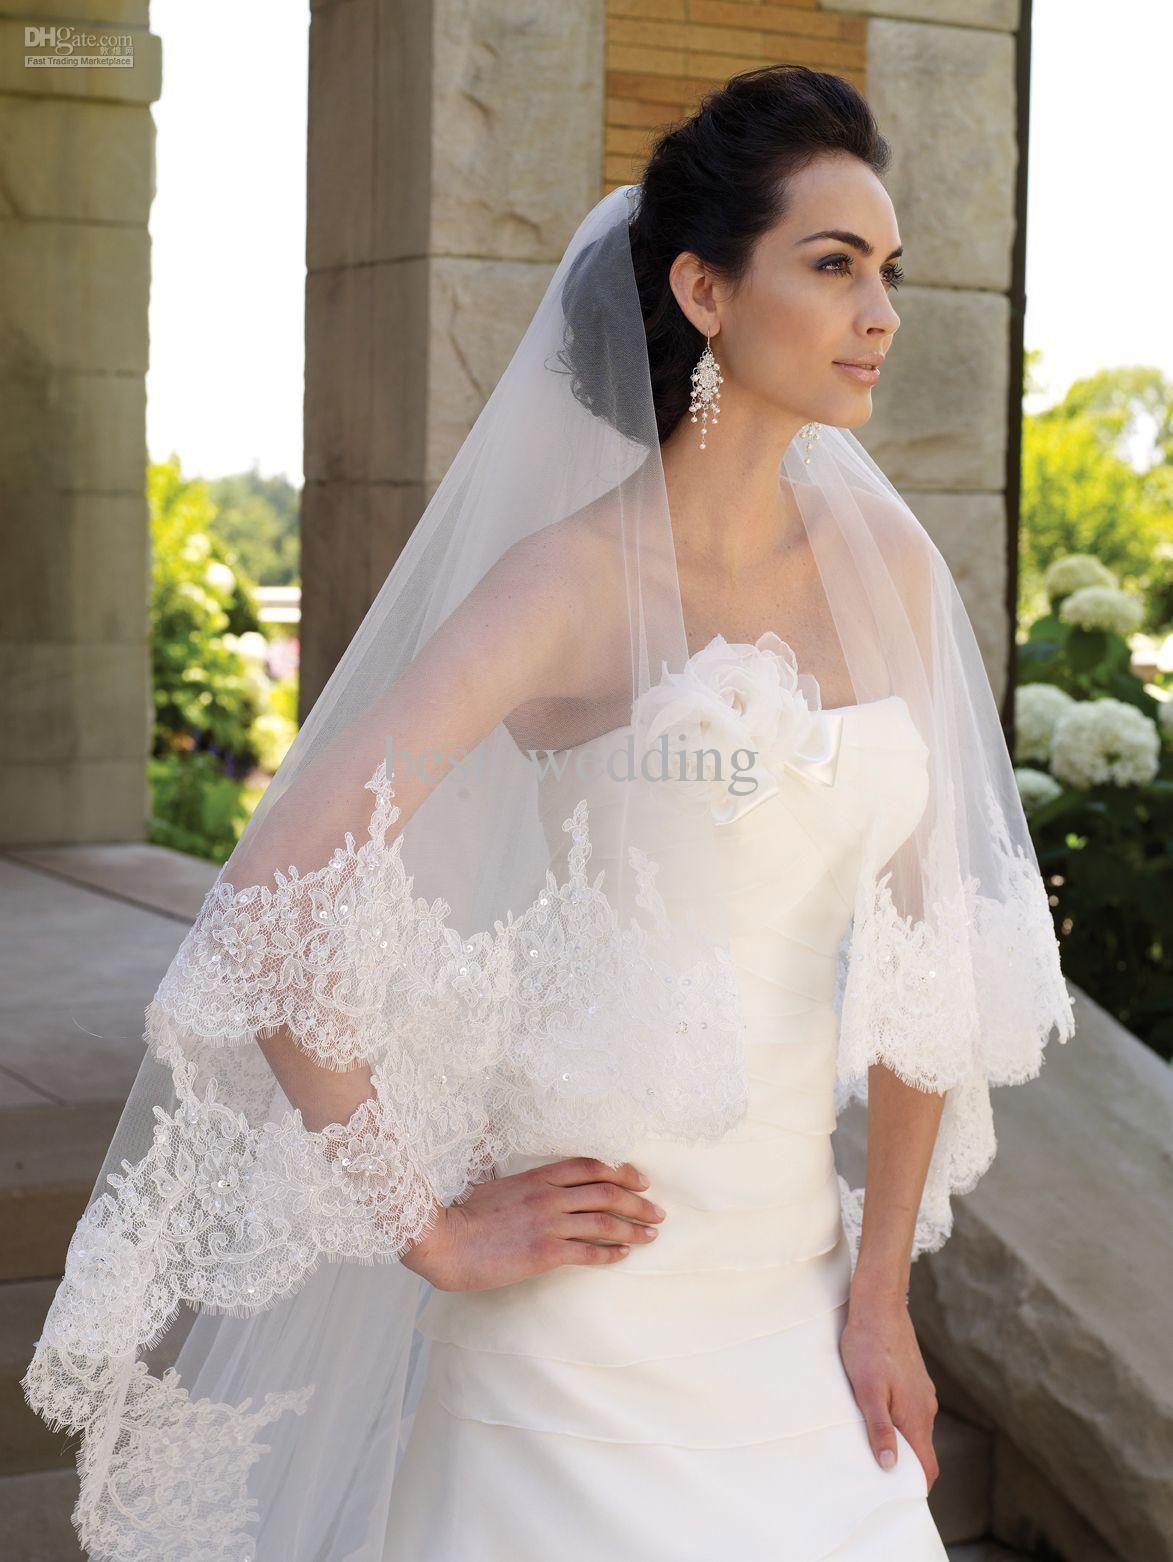 Luxury white lace applique wedding veils for wedding dresses bridal